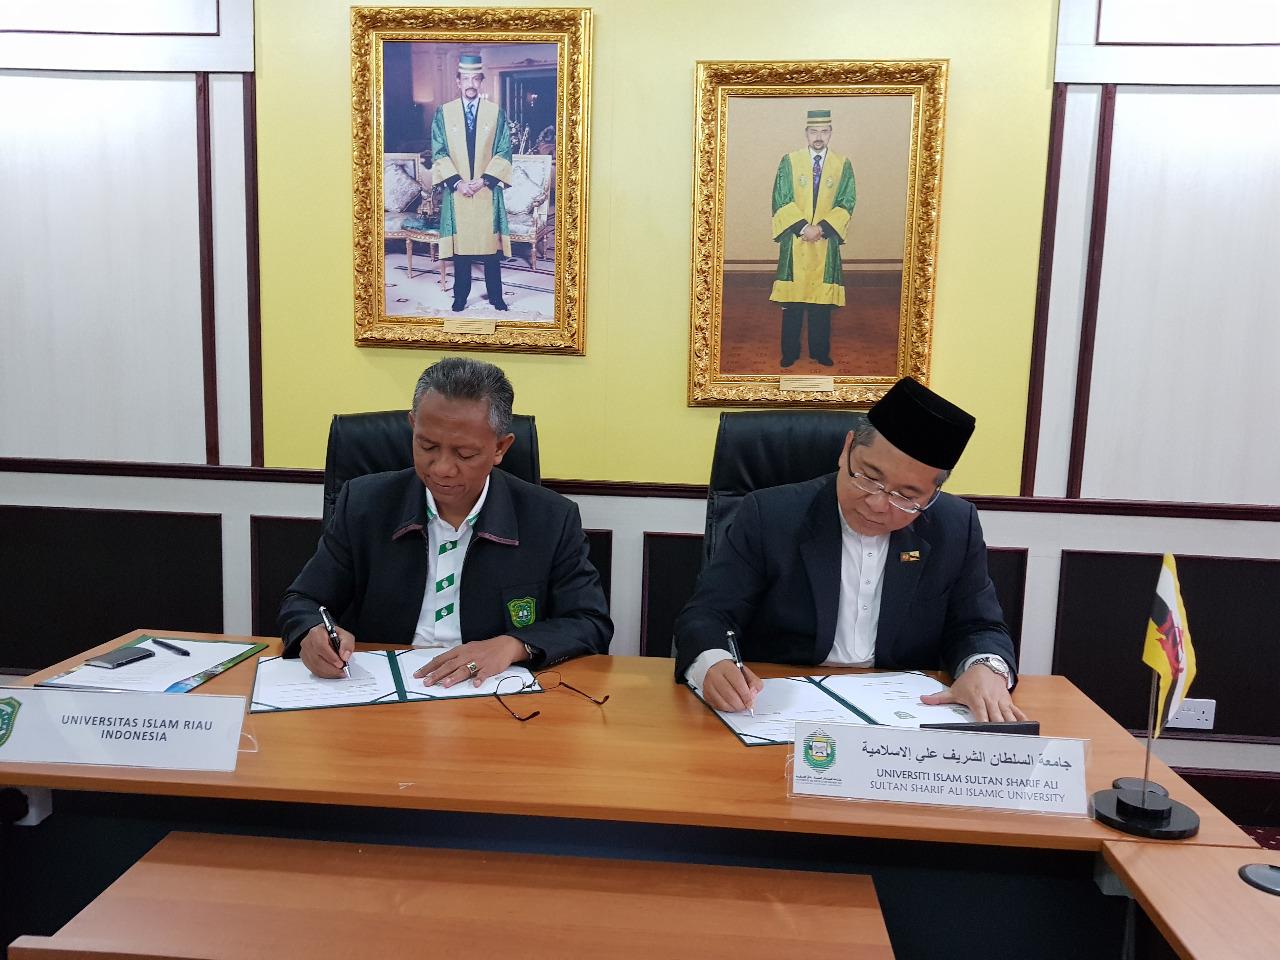 Gandeng UIR, UNISSA Buka Kerjasama Fakultas Pertanian</a>